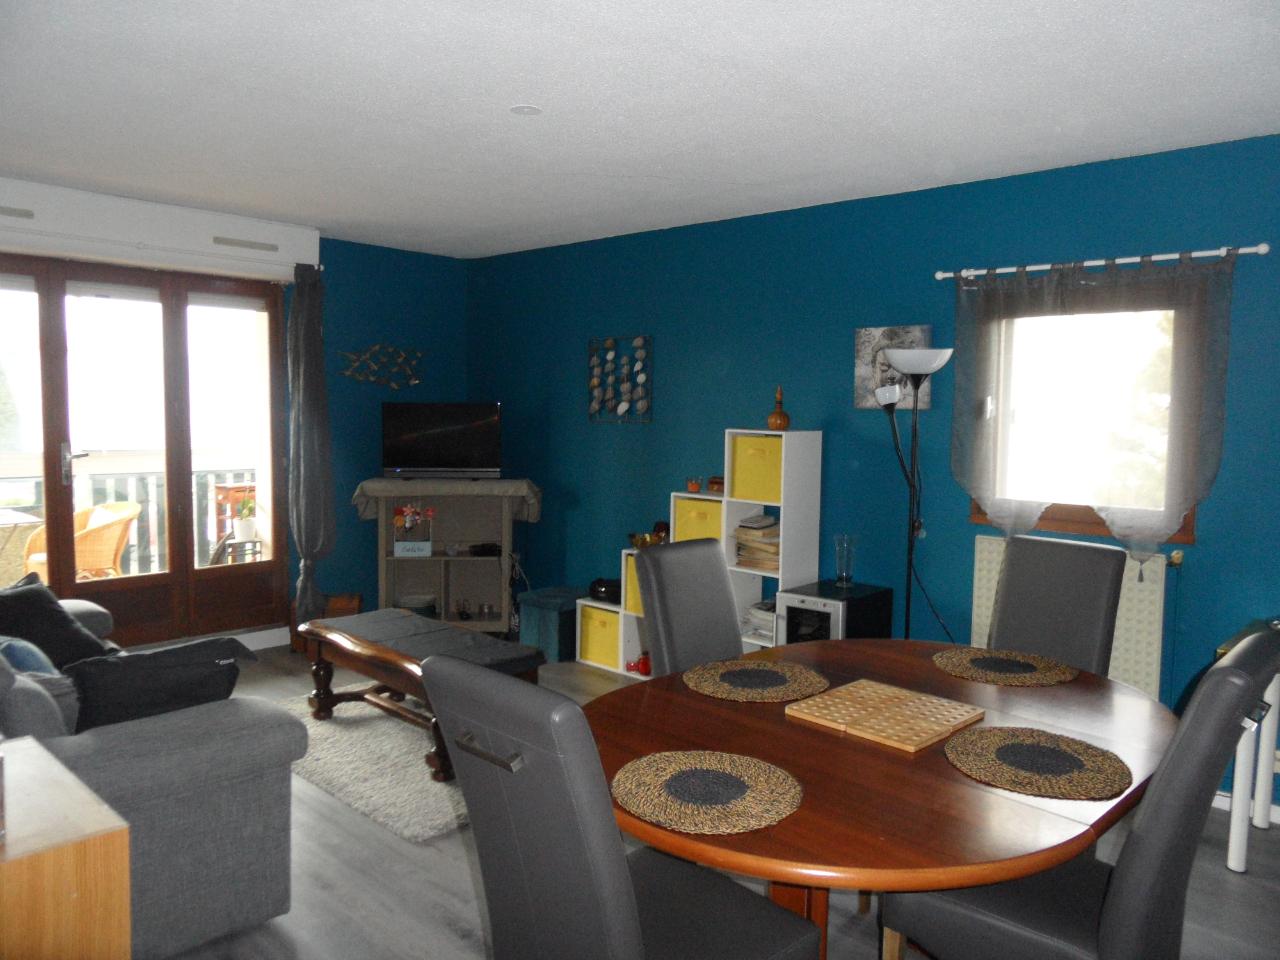 Vente appartement T3  à HENDAYE - 2